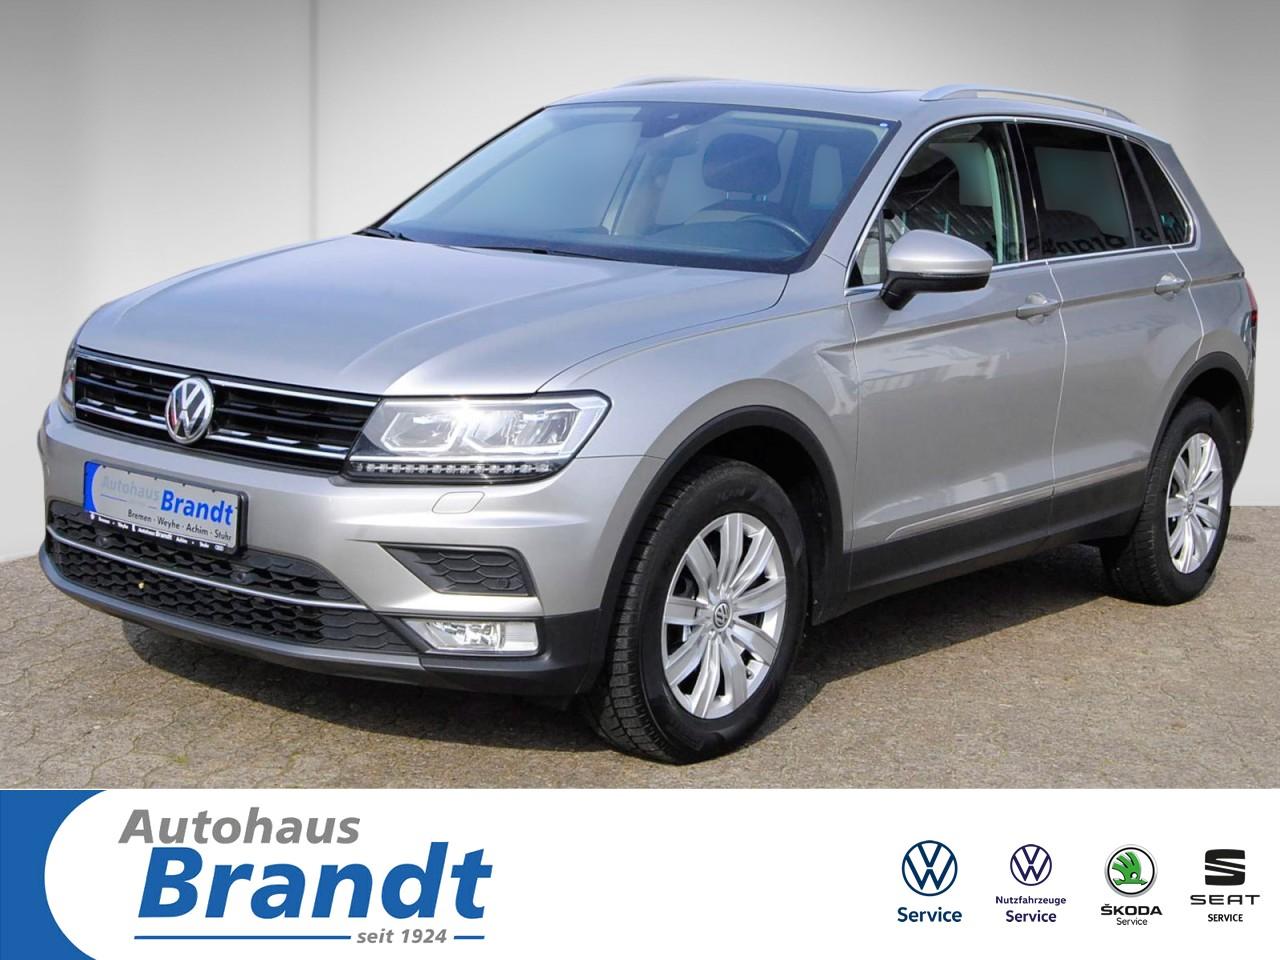 Volkswagen Tiguan 2.0 TDI DSG*4M*LED*NAVI*ACC*PANO*PDC*SHZ, Jahr 2017, Diesel